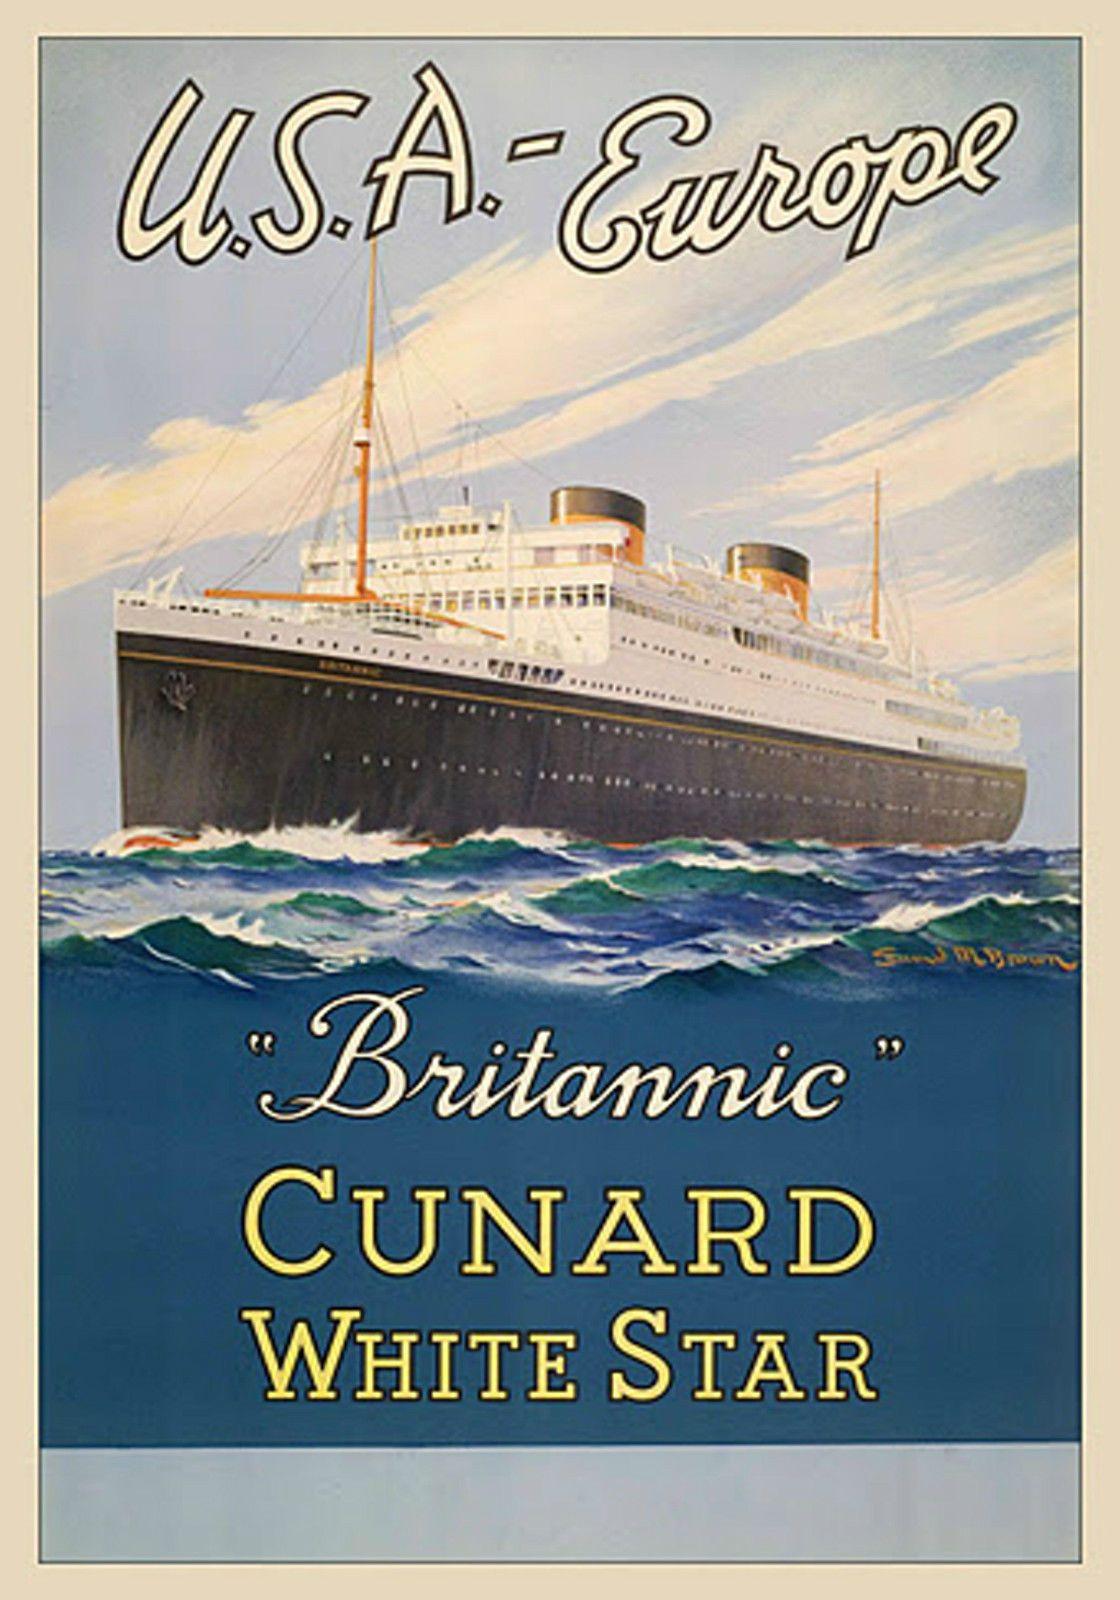 http://www.ebay.com/itm/MAGNET-Vintage-Travel-Poster-CUNARD-Liner-Britannic-USA-Europe-Free-Shipping-/250961573748?pt=LH_DefaultDomain_0